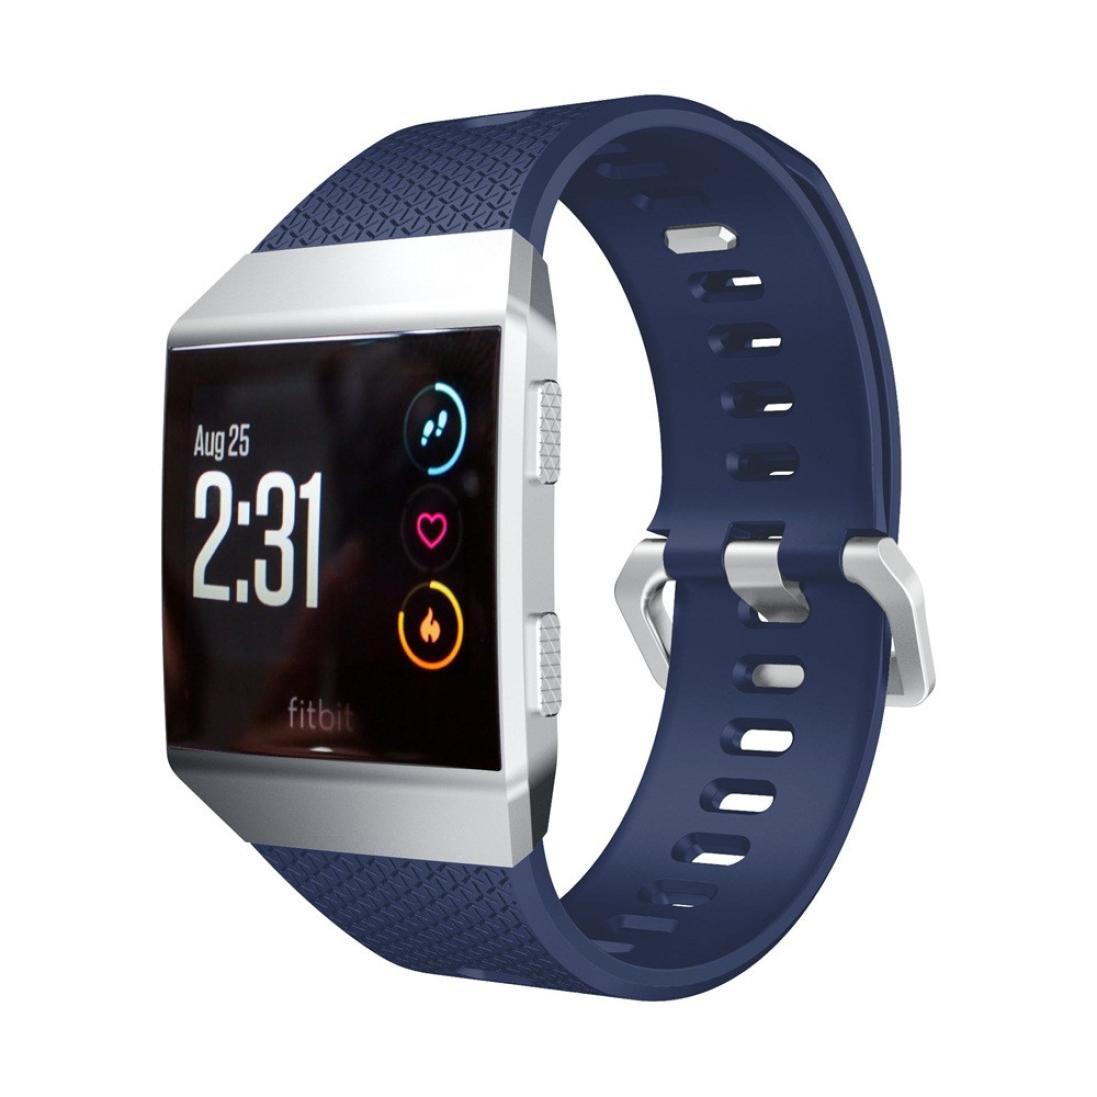 For Fitbit Ionic Smart Fitness Watch、Binmer (TM) ソフトシリコン交換スポーツバンドストラップ 6.7